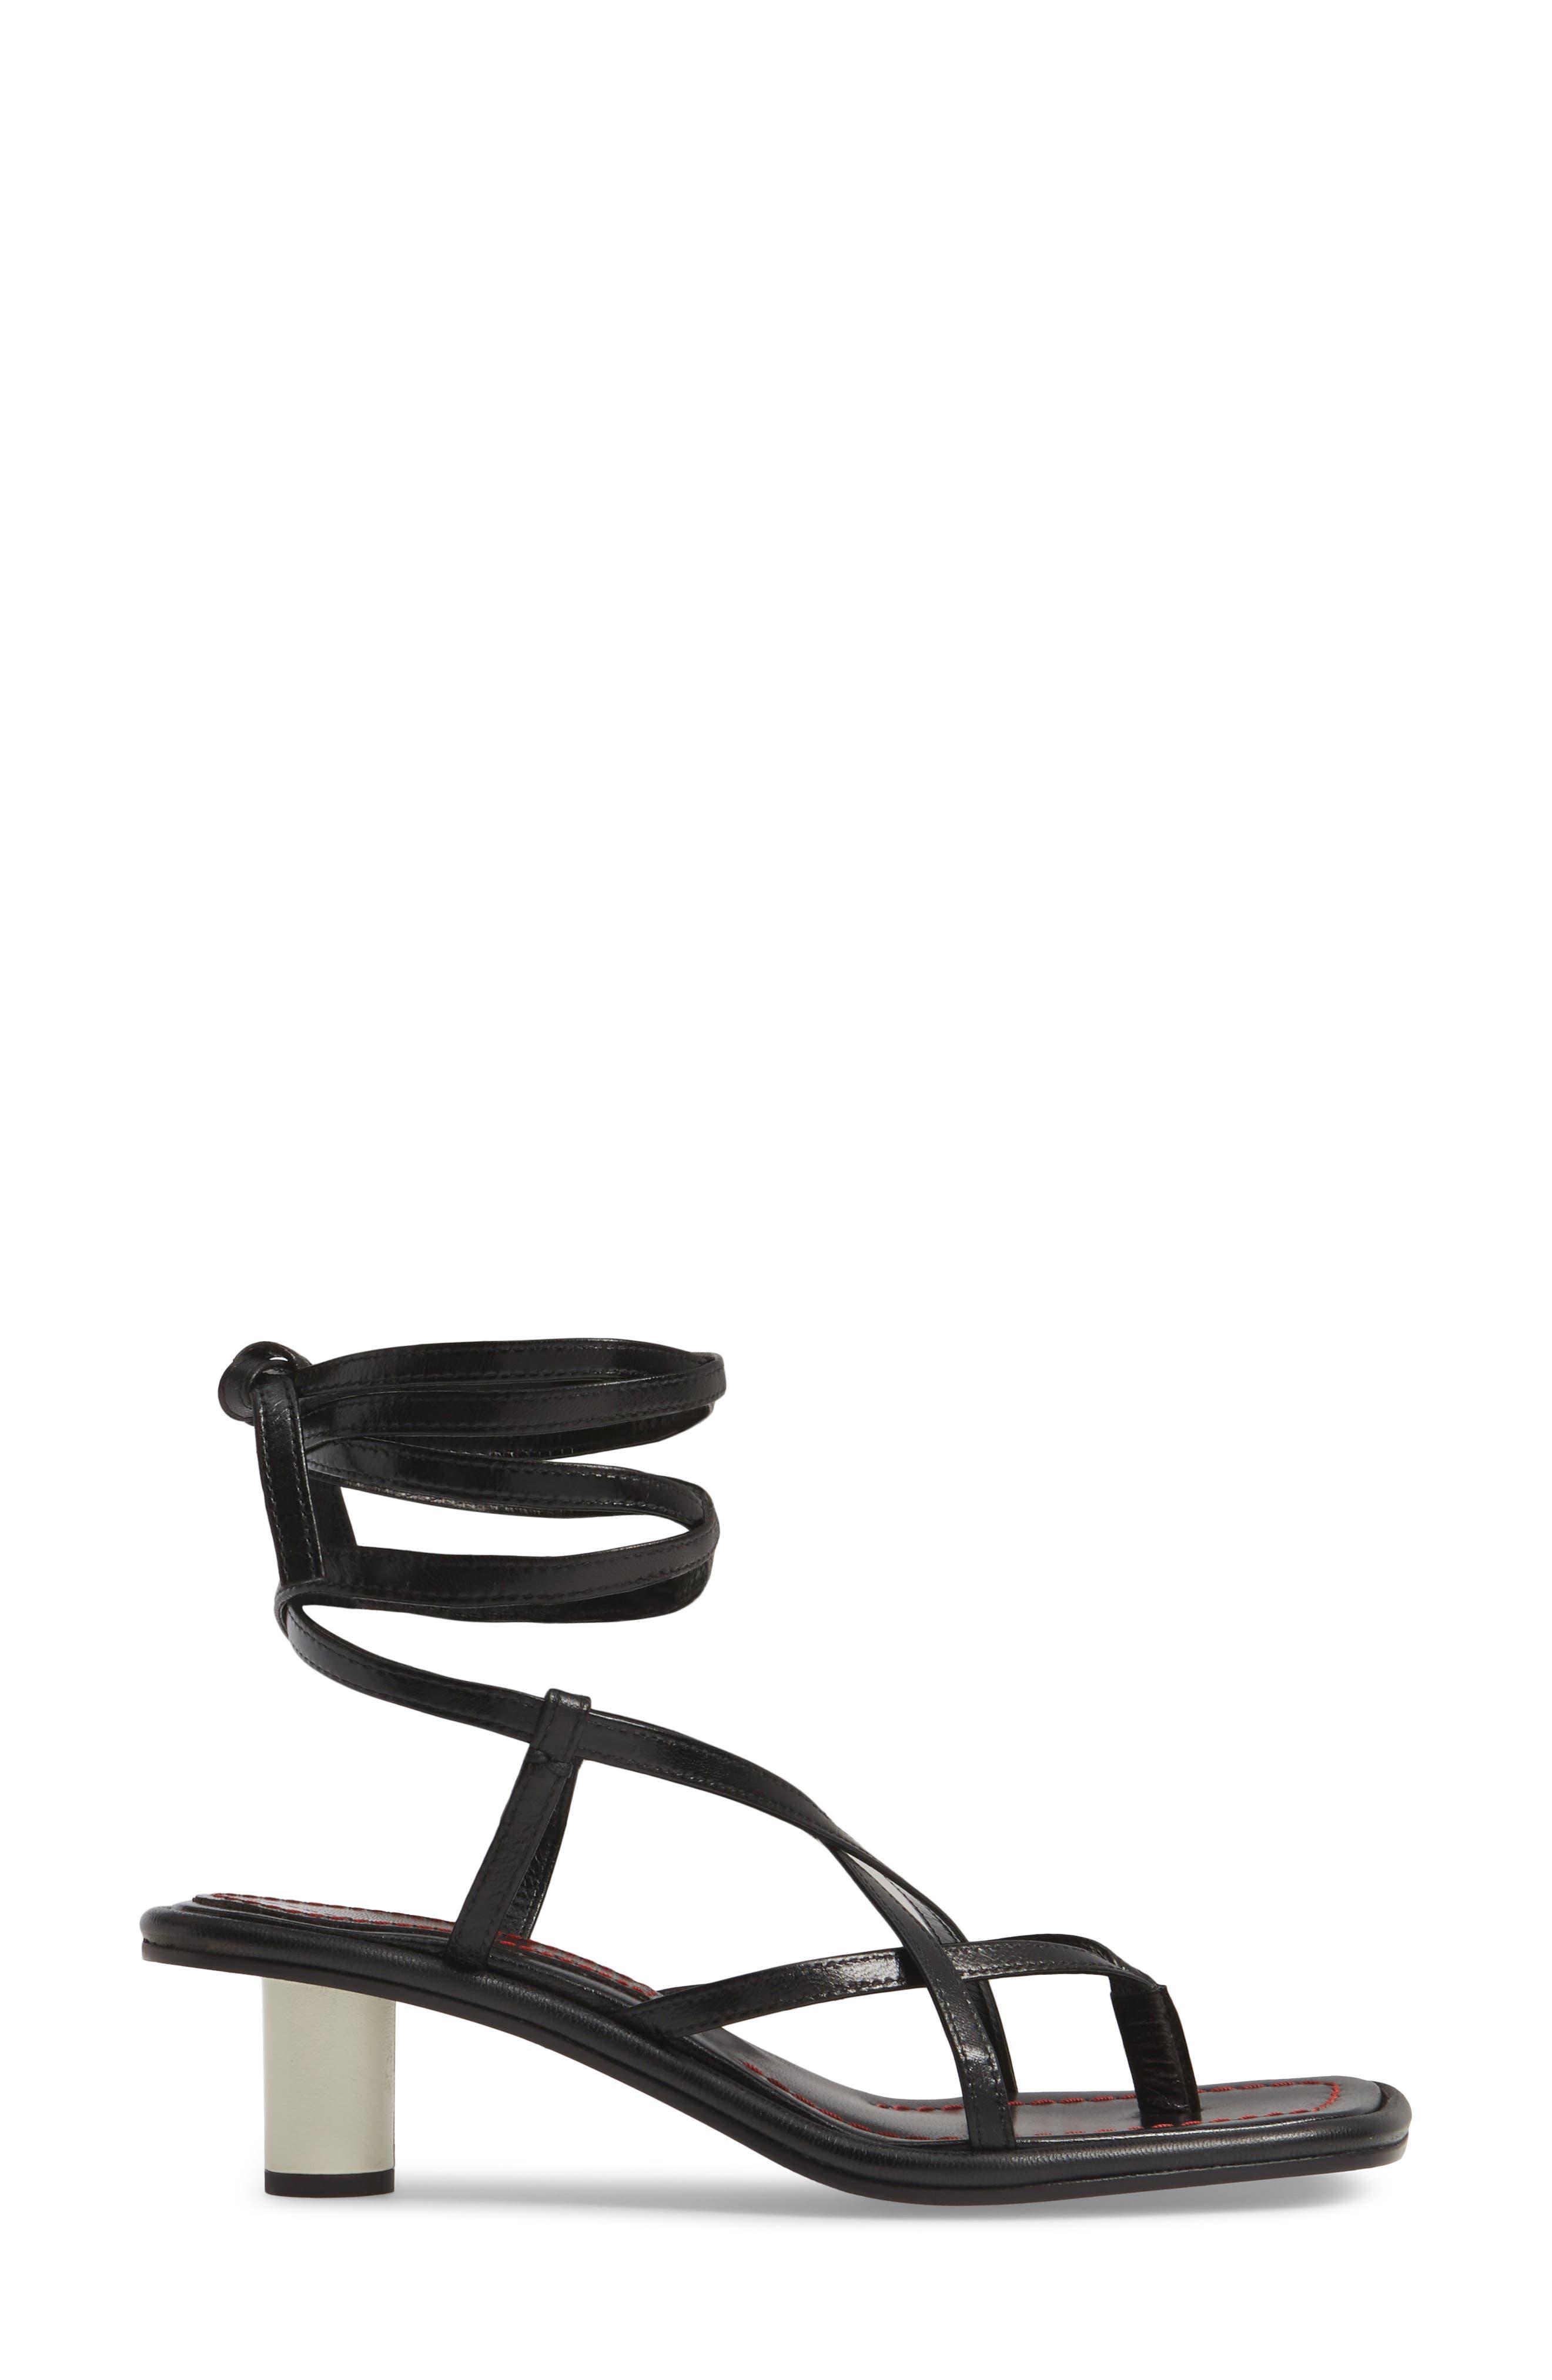 PROENZA SCHOULER, Wraparound Ankle Strap Sandal, Alternate thumbnail 3, color, BLACK